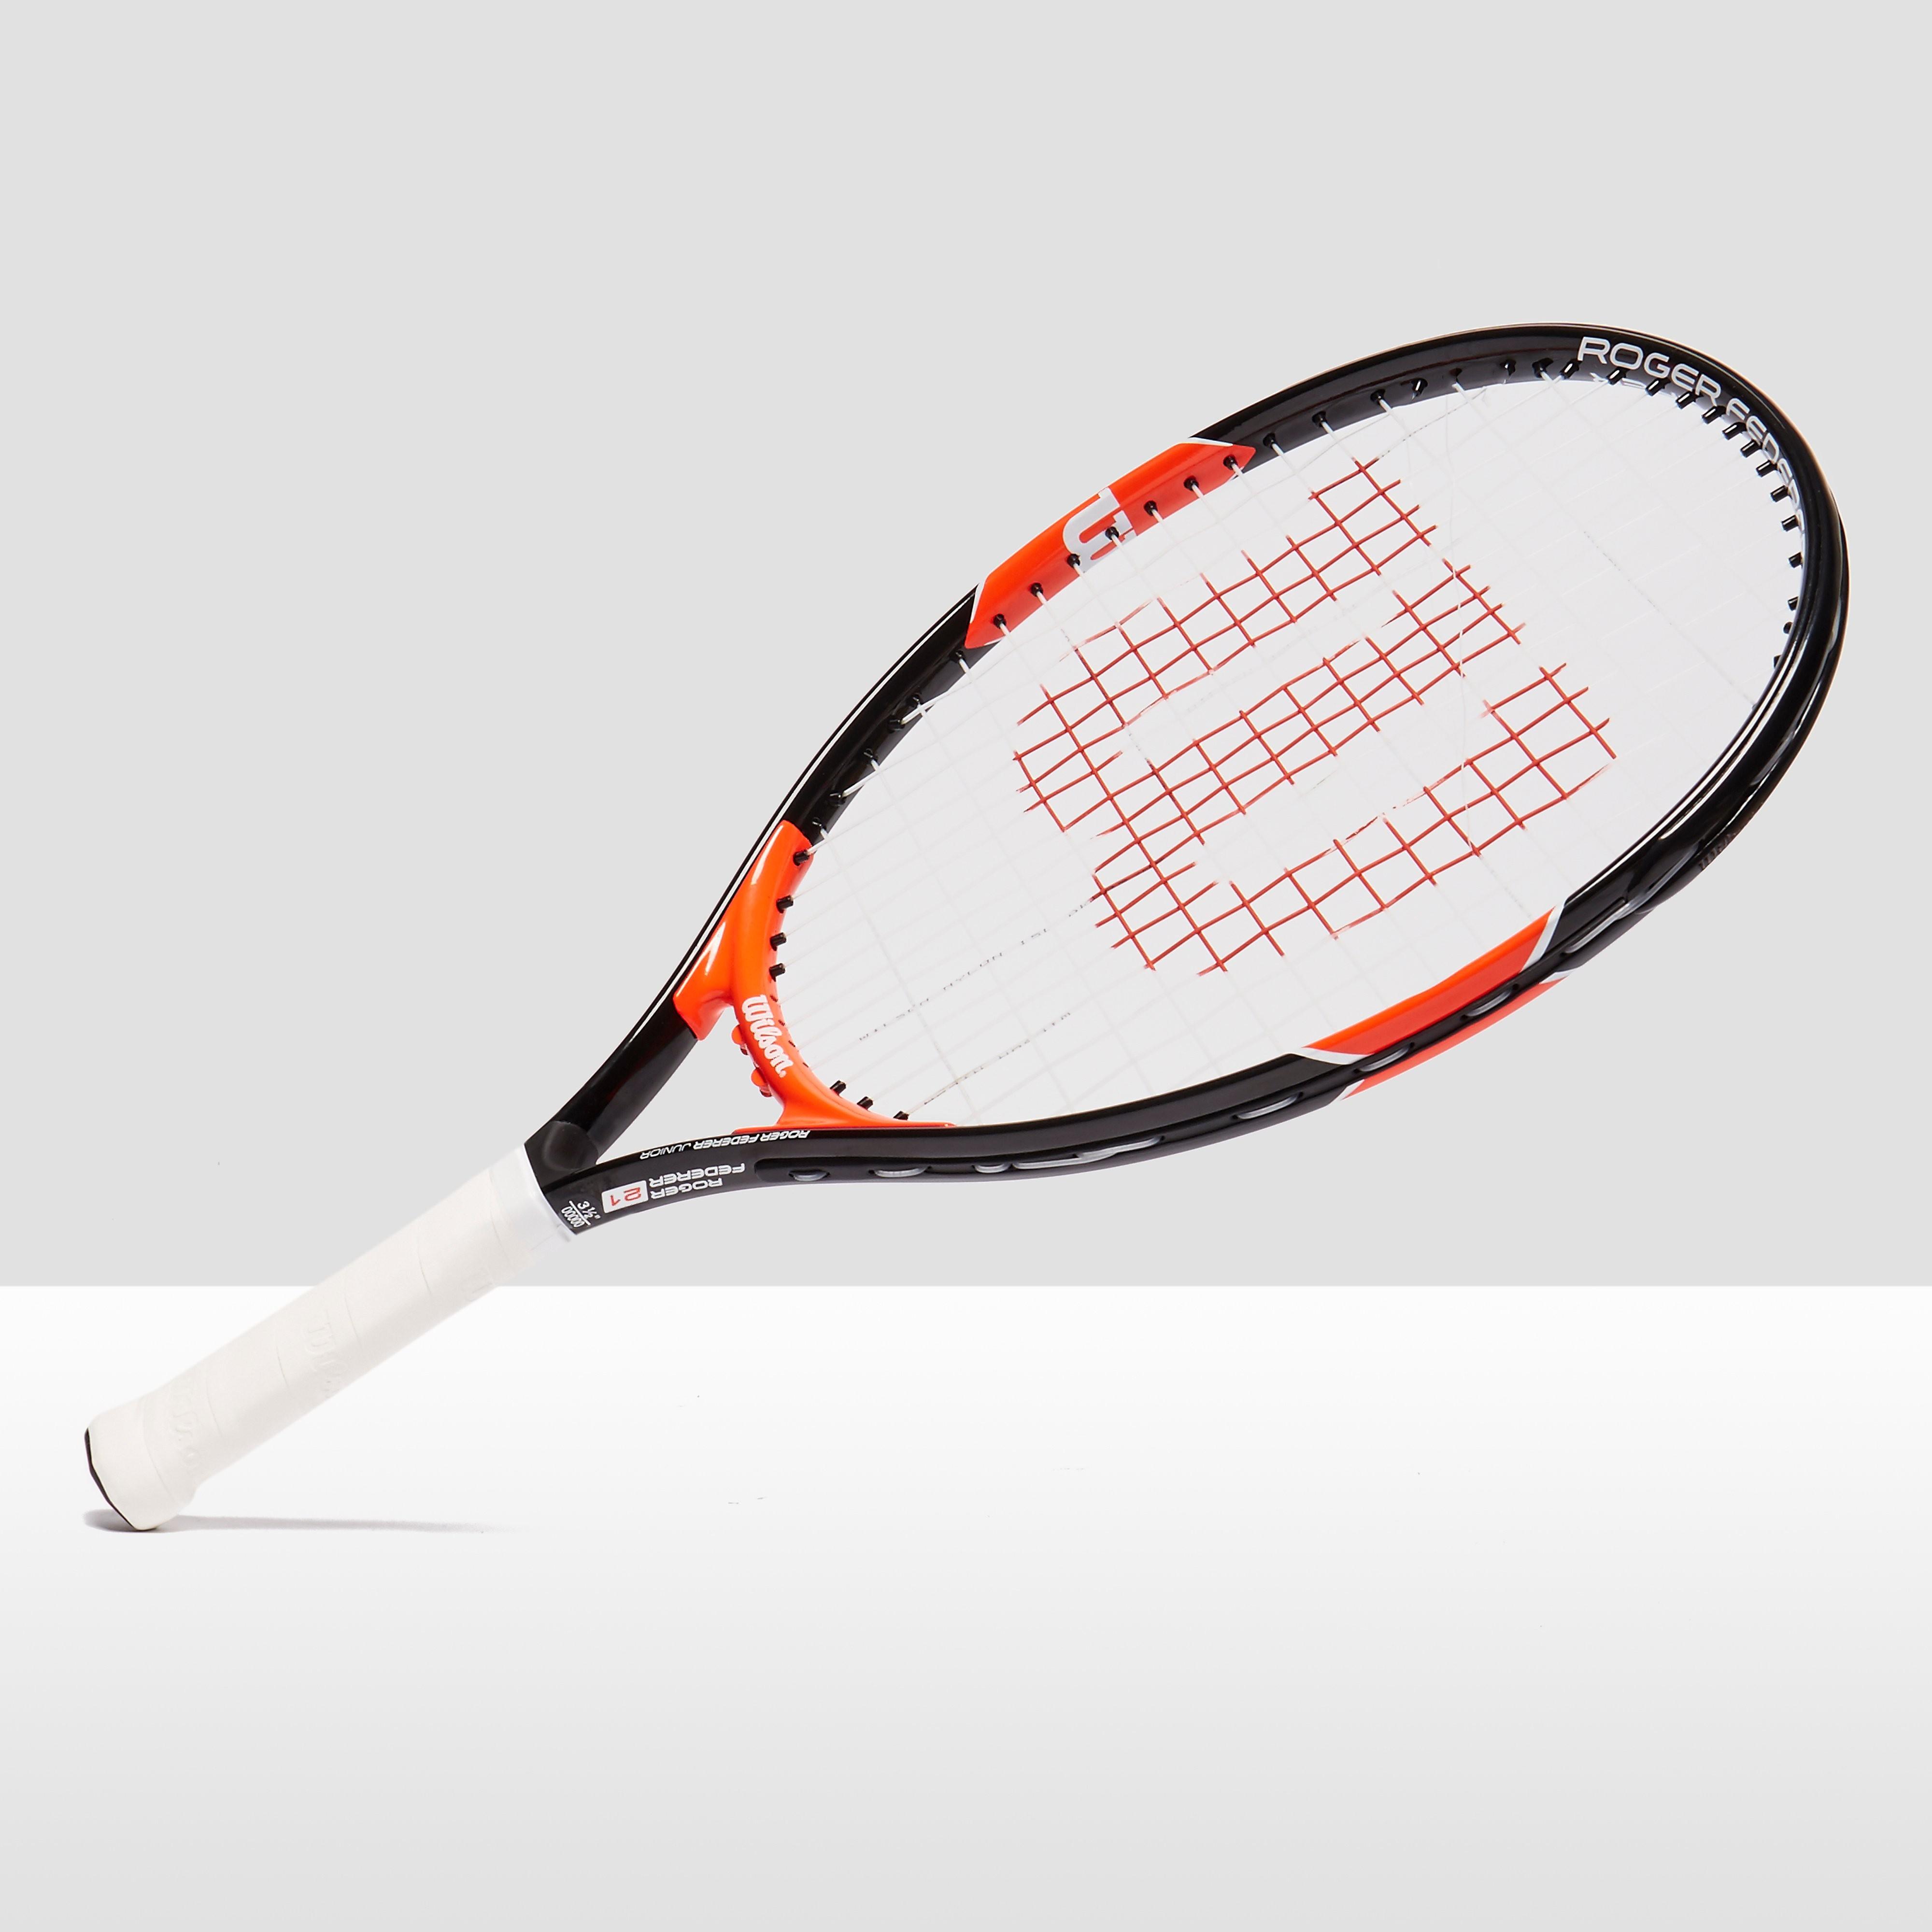 "Wilson Roger Federer 21"" Junior Tennis Racket (Aluminium)"